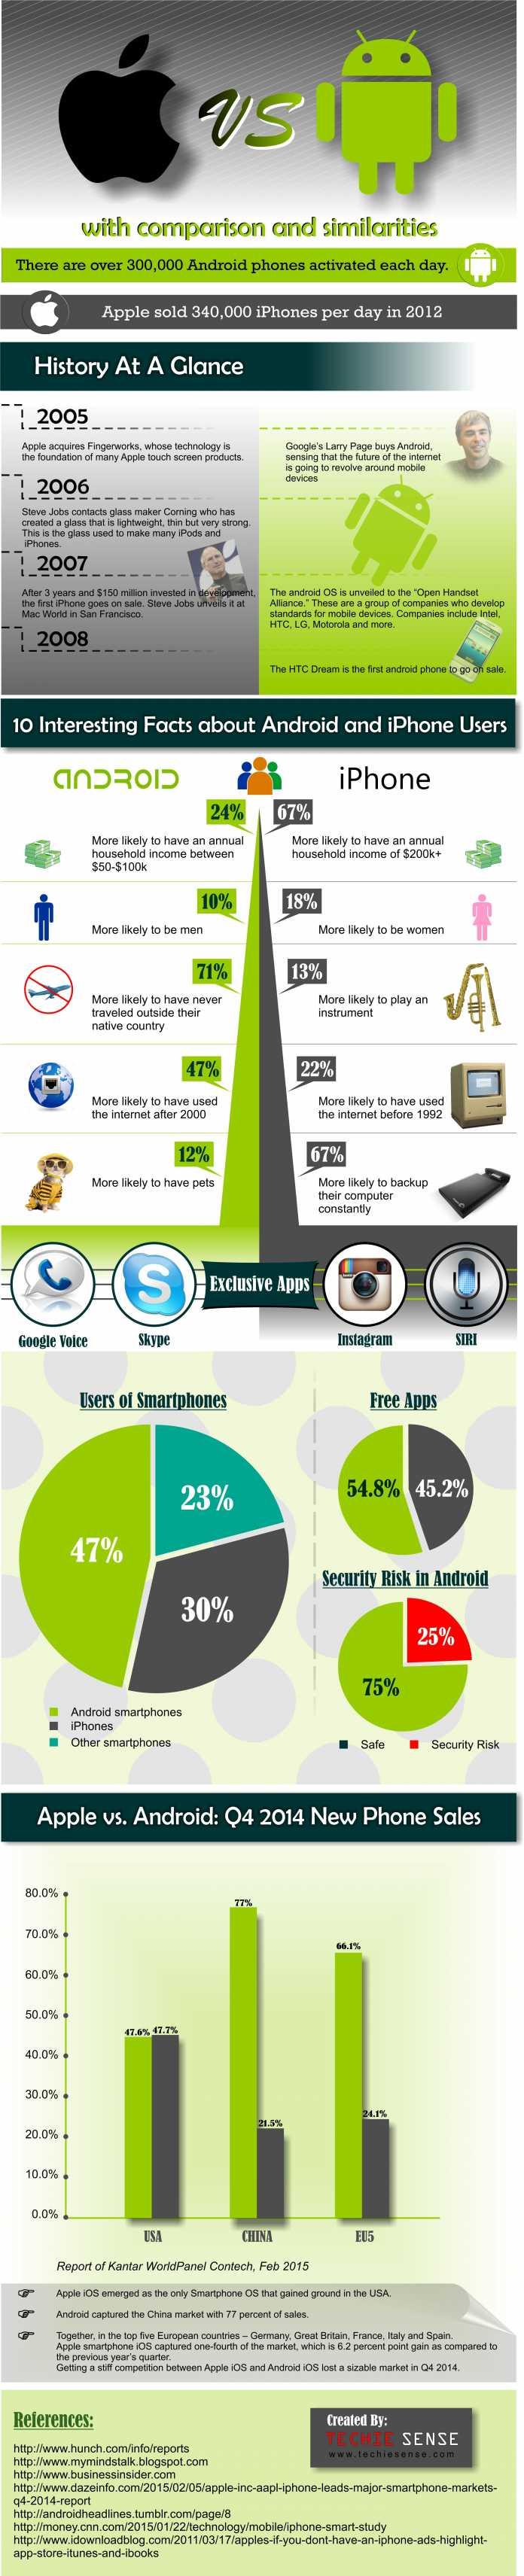 Interesting Android vs. iPhone Comparison